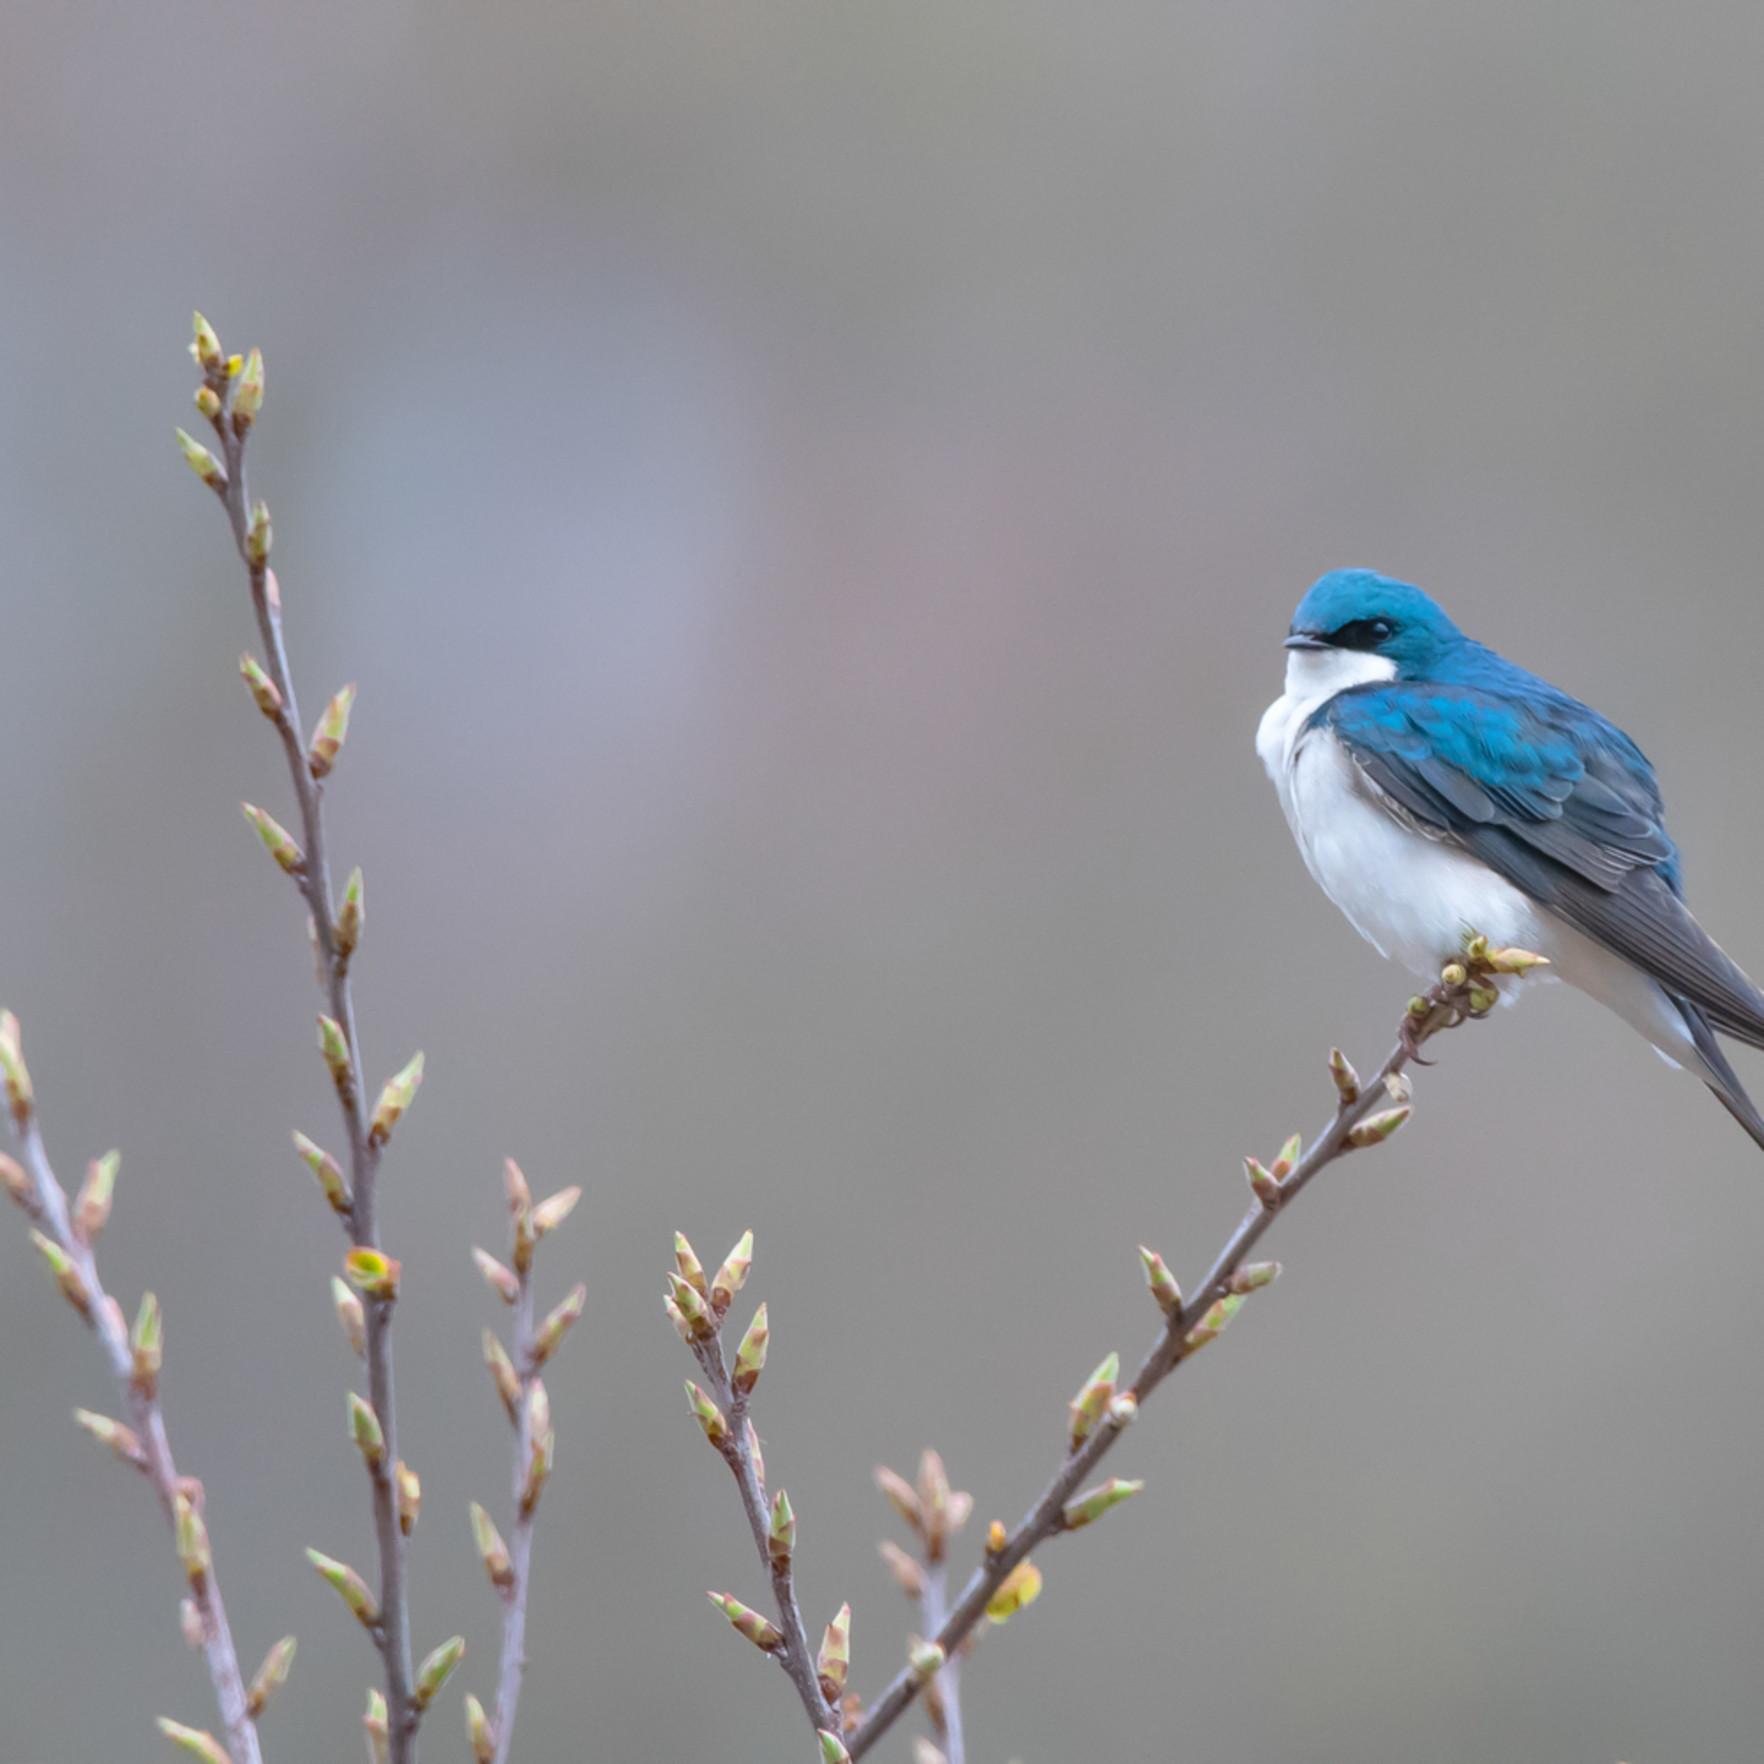 Tree swallow pfgiy5